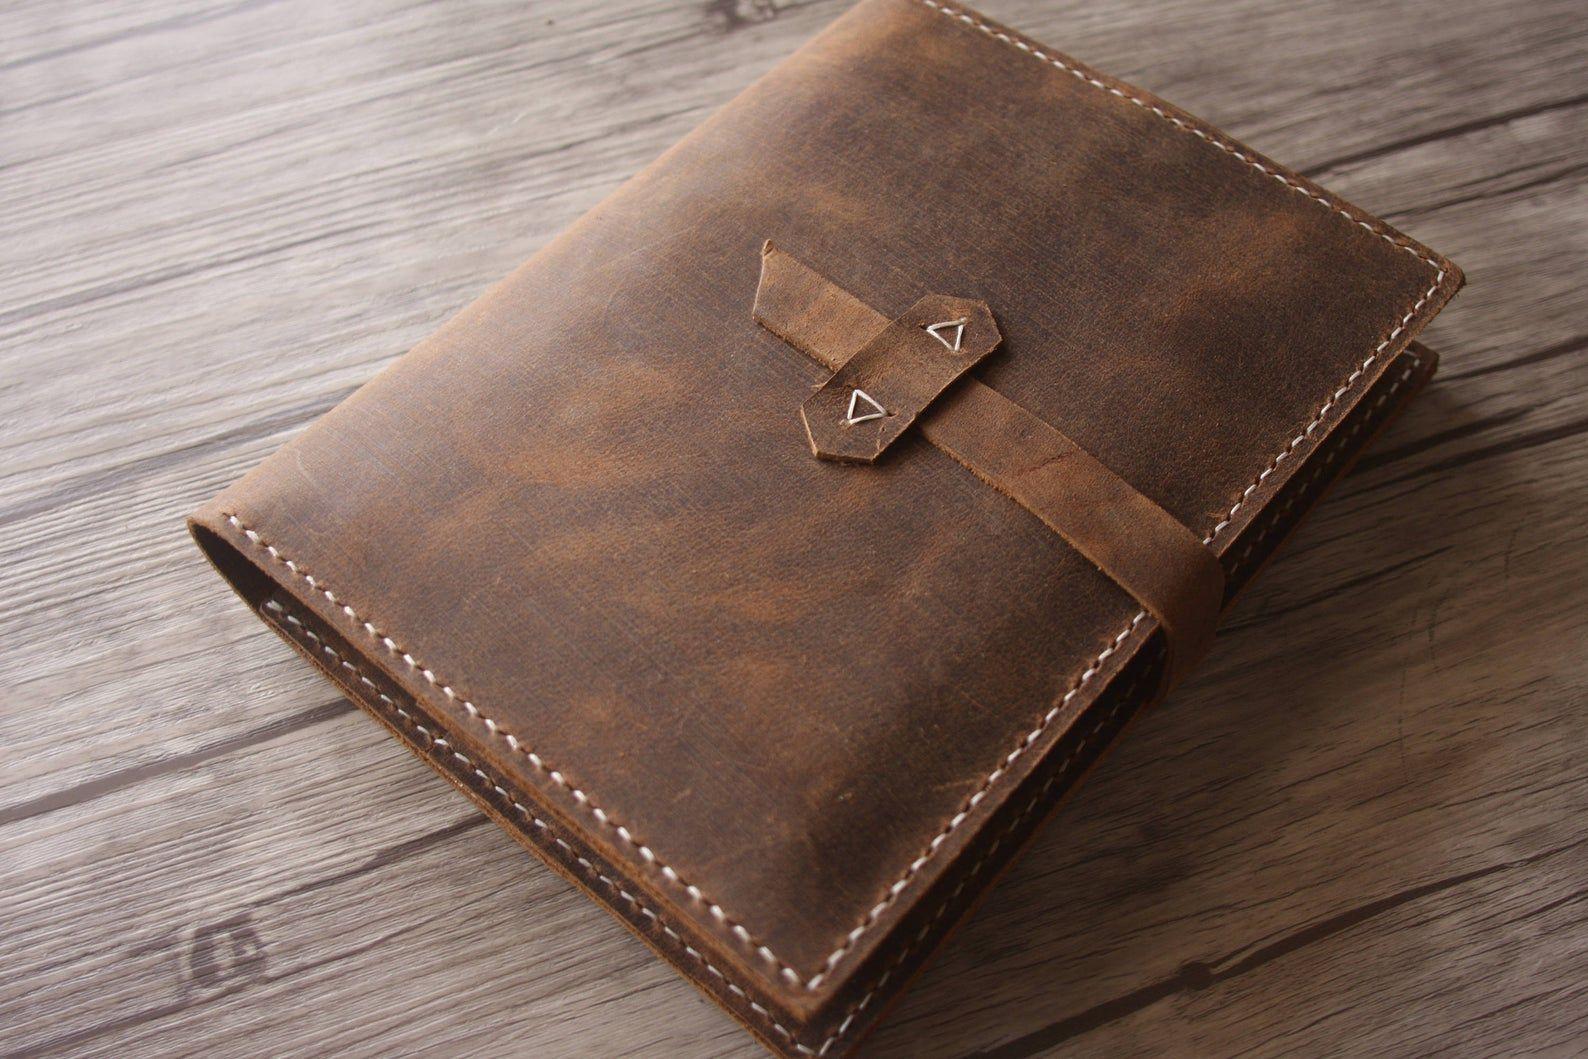 Personalized MacBook Case, MacBook Pro 2016 Case Bags